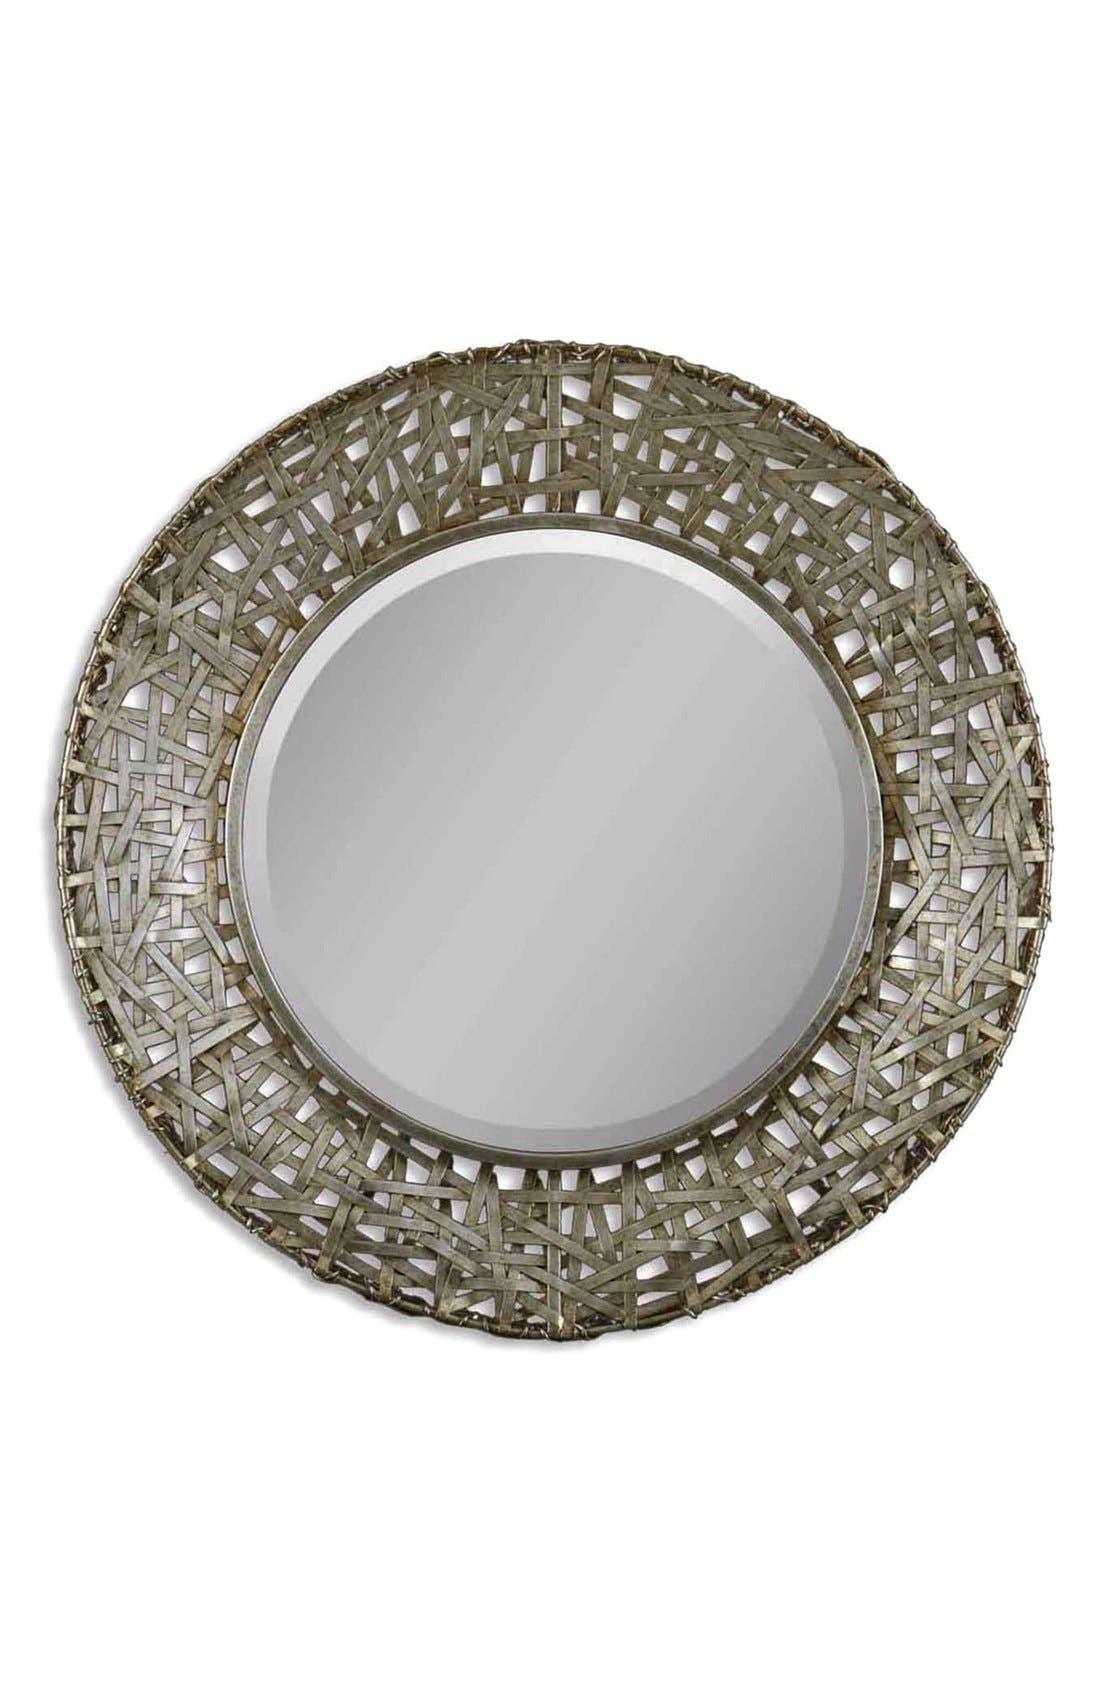 Main Image - Uttermost 'Alita' Woven Metallic Frame Mirror